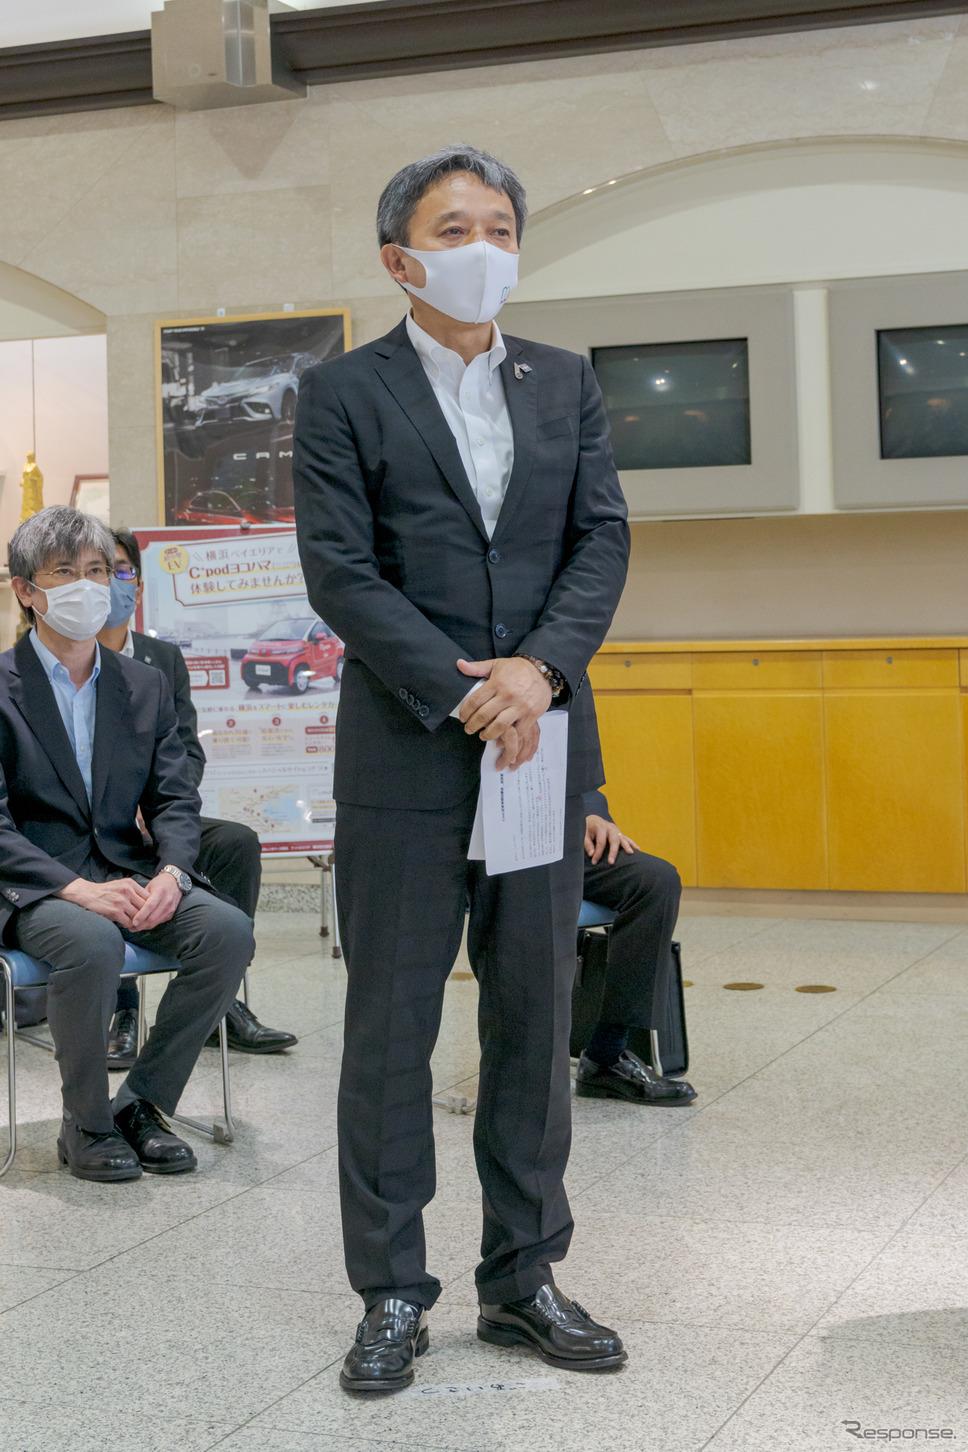 株式会社アットヨコハマ取締役・東昭人氏。《写真撮影 関口敬文》